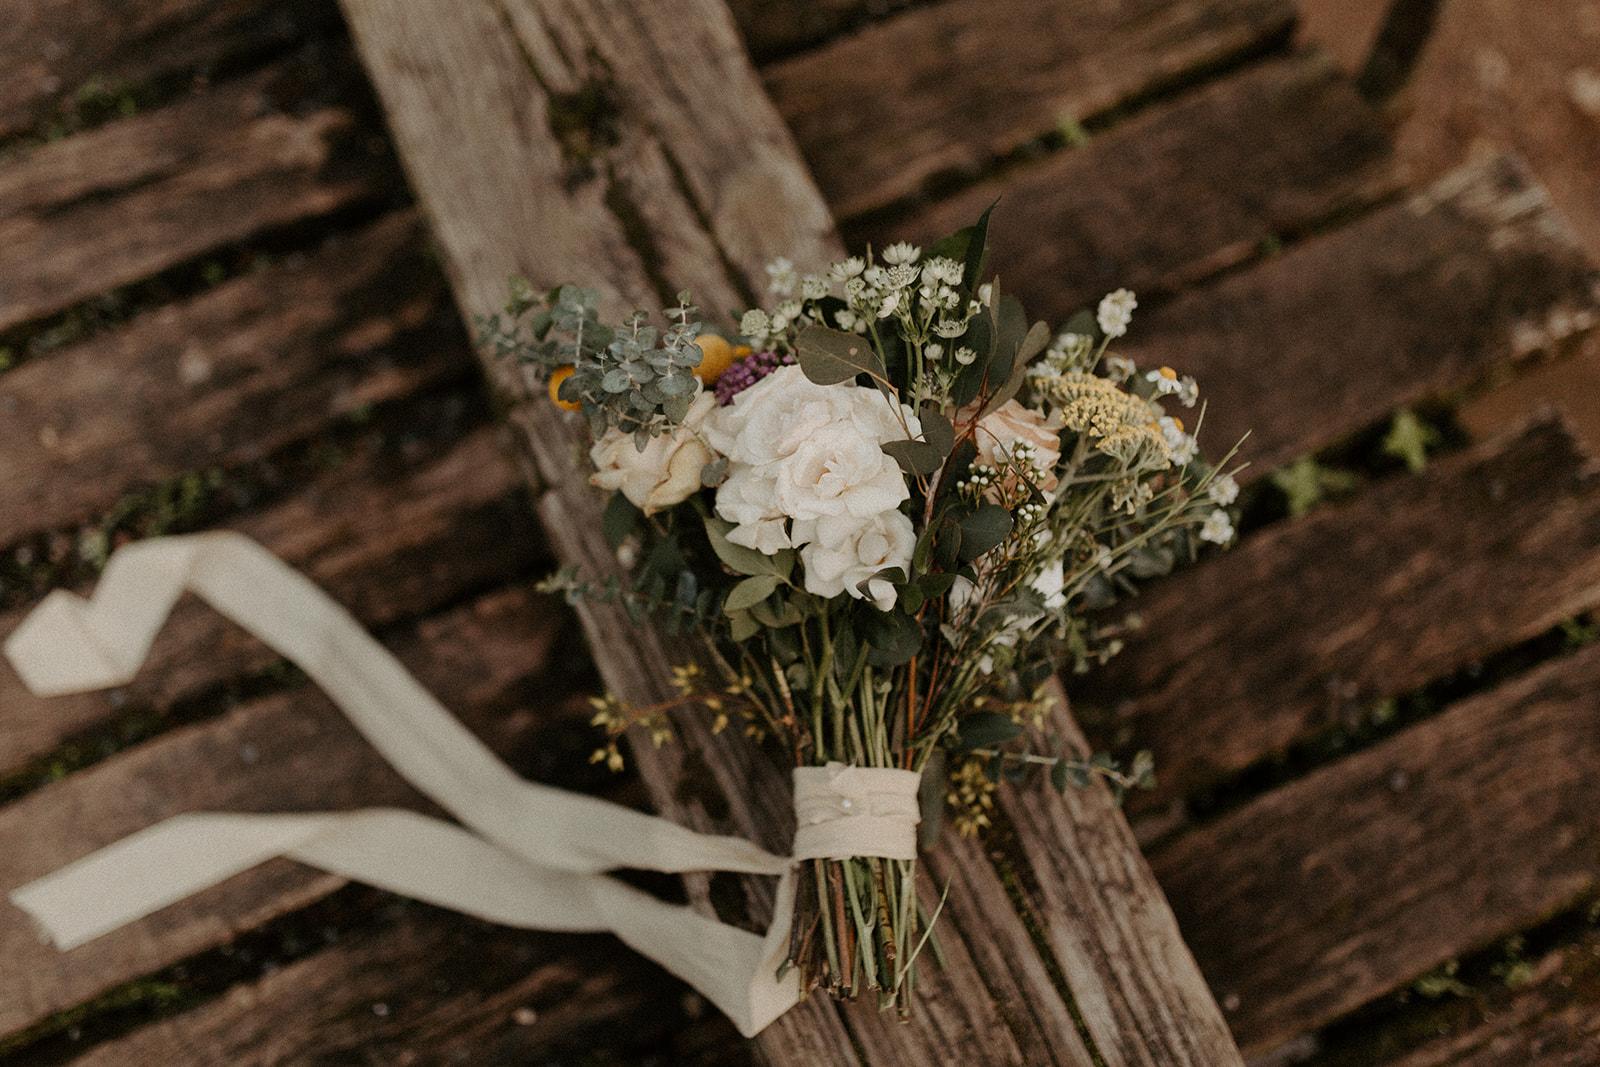 camp_wokanda_peoria_illinois_wedding_photographer_wright_photographs_bliese_0817.jpg